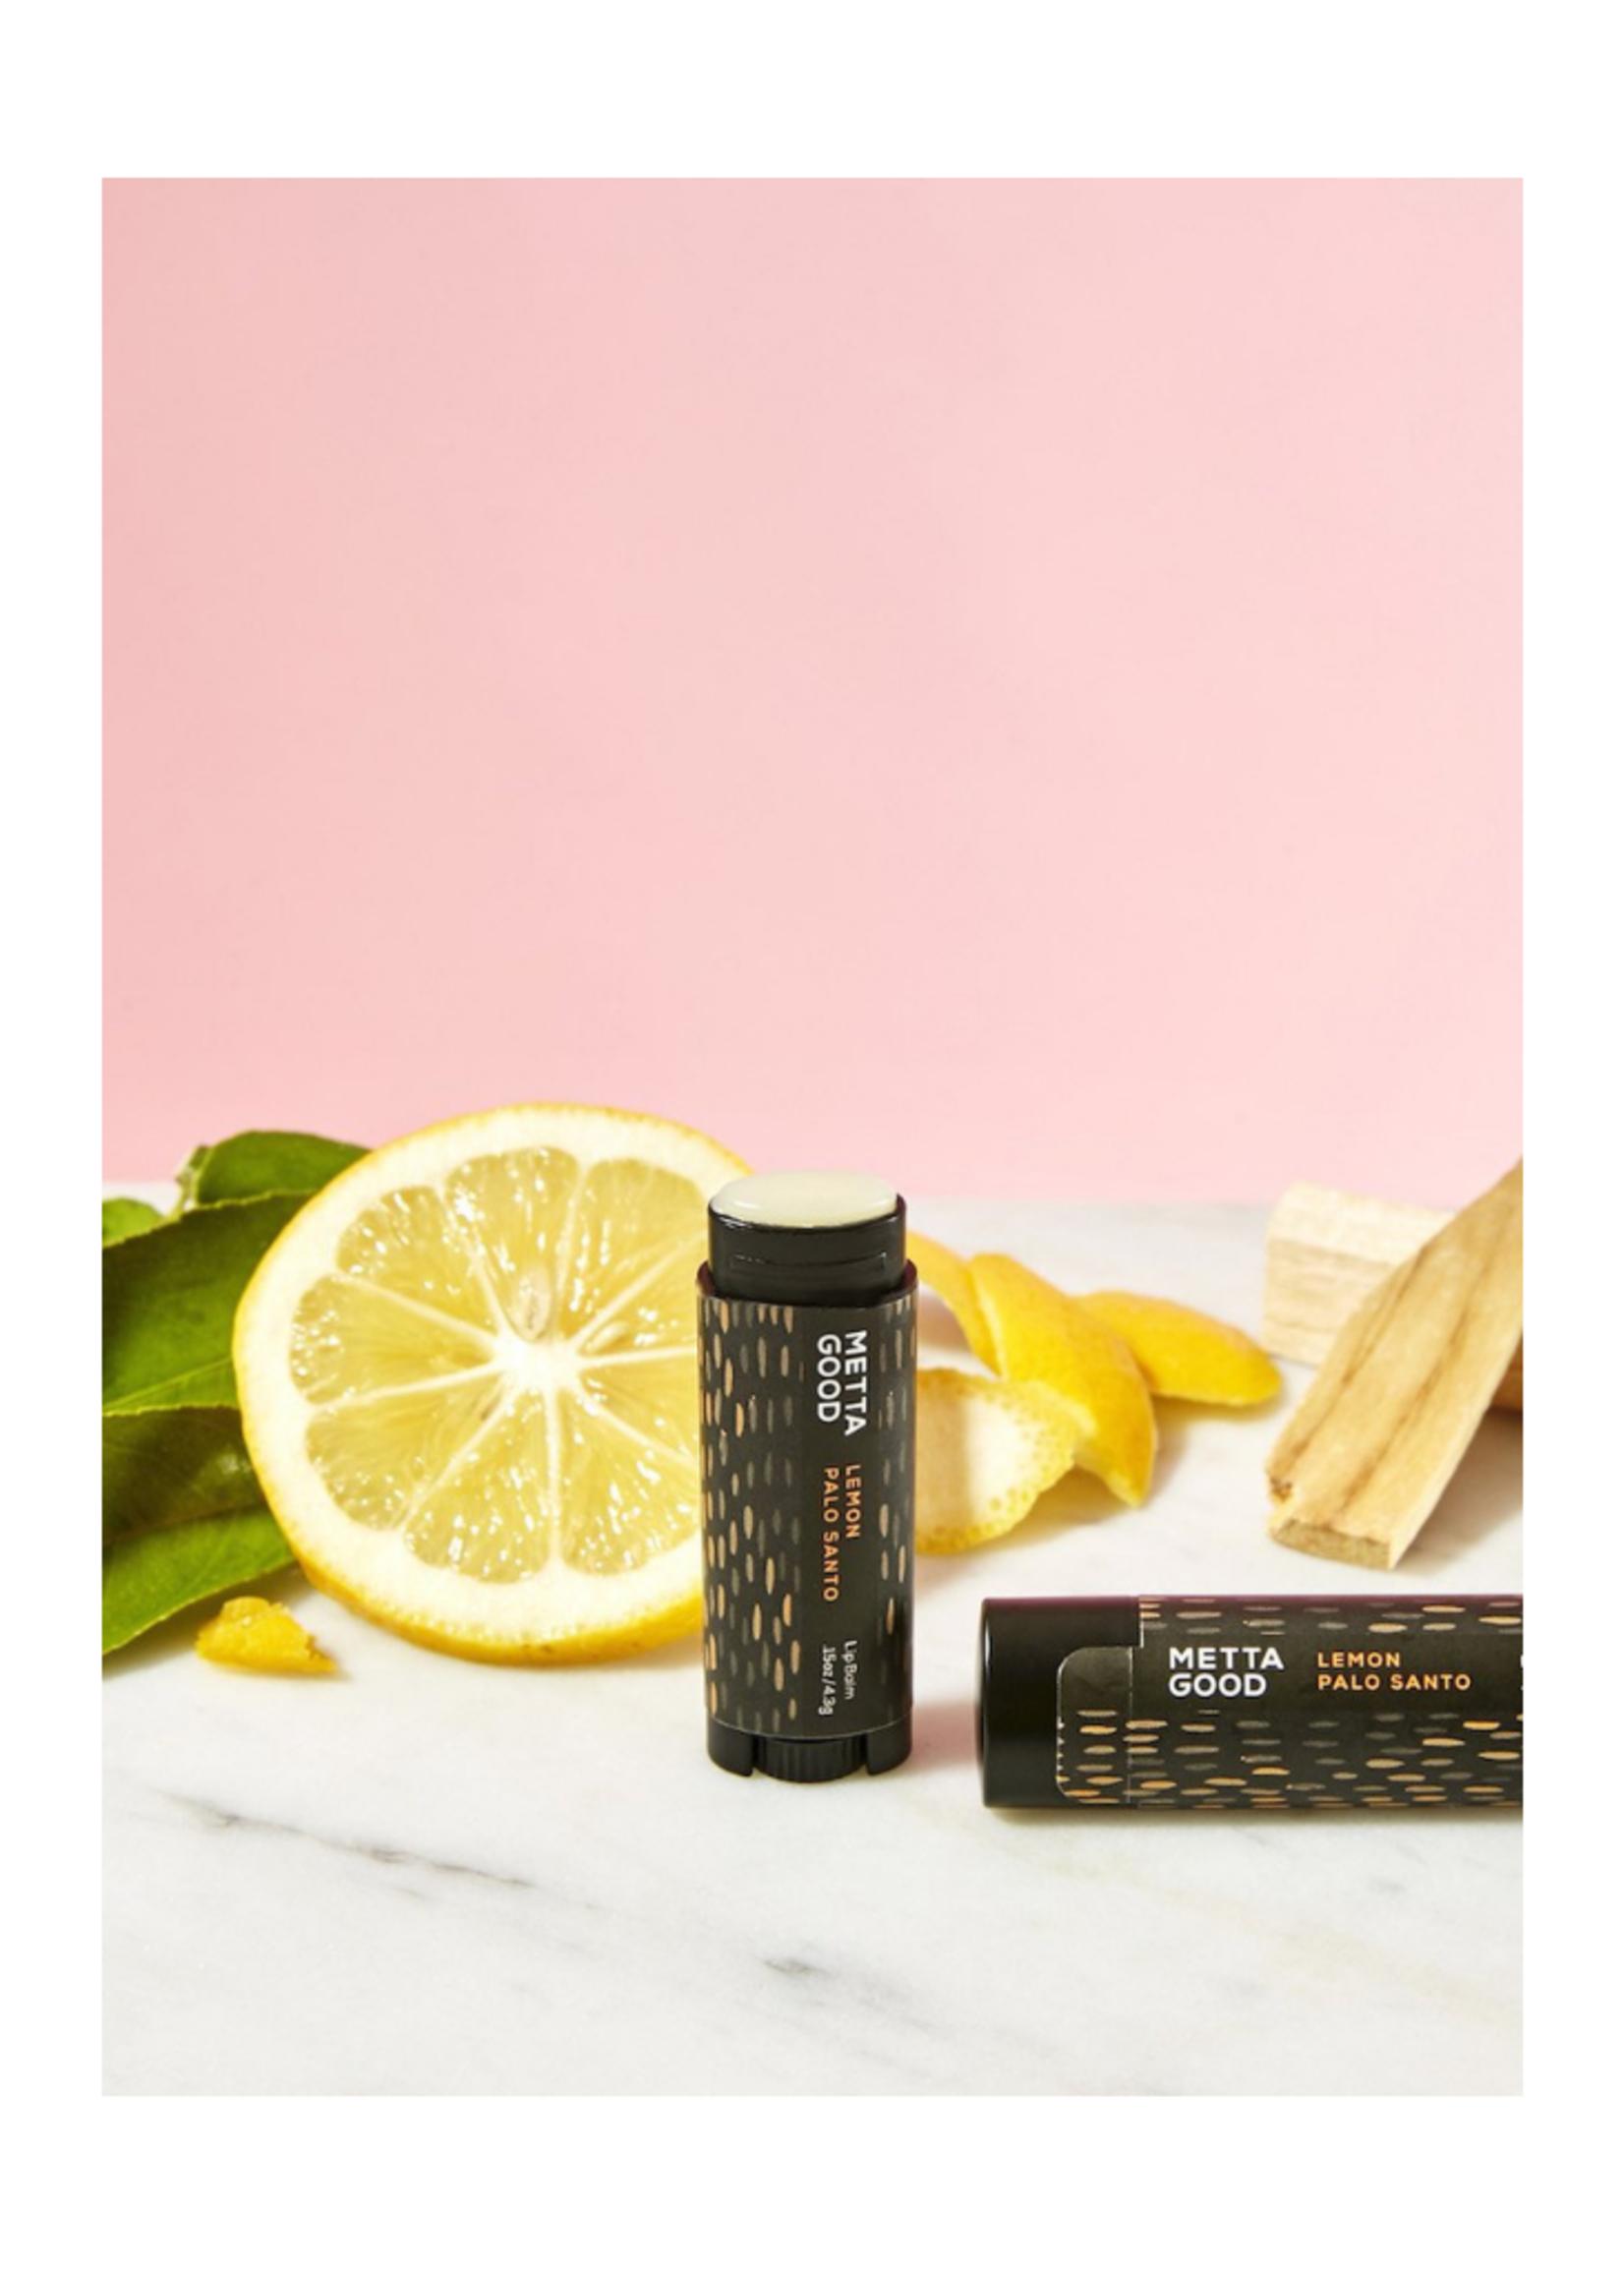 Metta Good Natural Lip Balm - Lemon Palo Santo